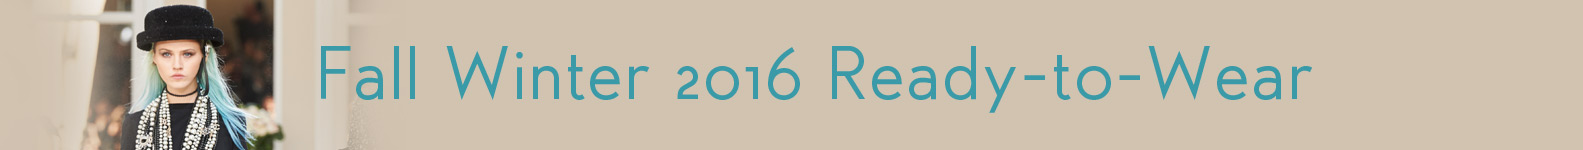 latest-fashion-shows-week-fall-winter-2016-fw16-paris-london-nyfw-new-york-milan